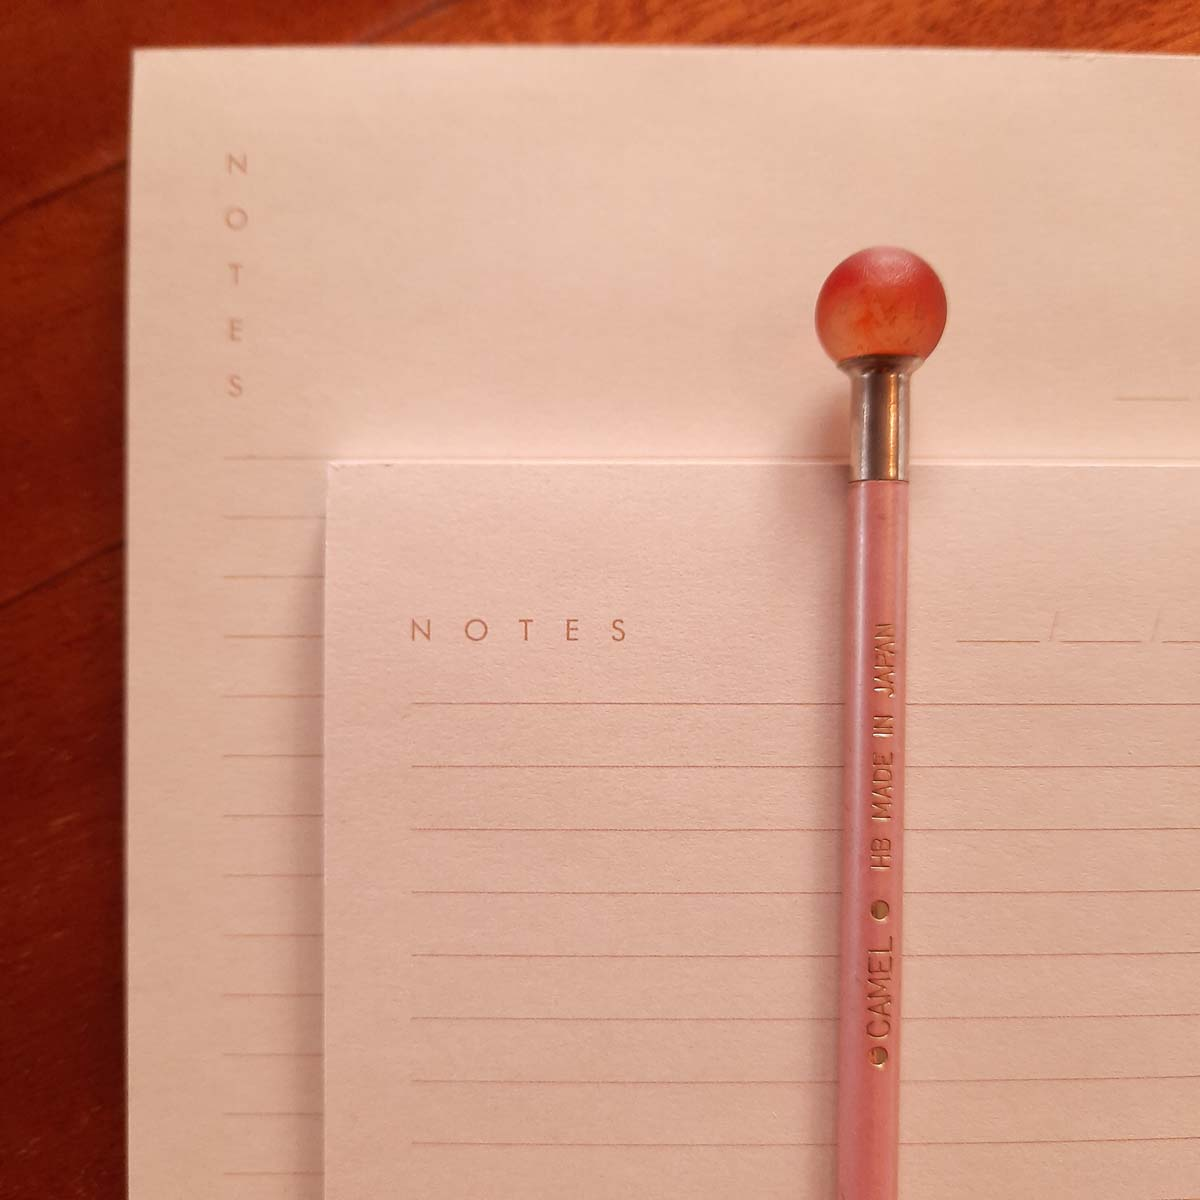 Close-up image of light peach Hamide Basics notepads